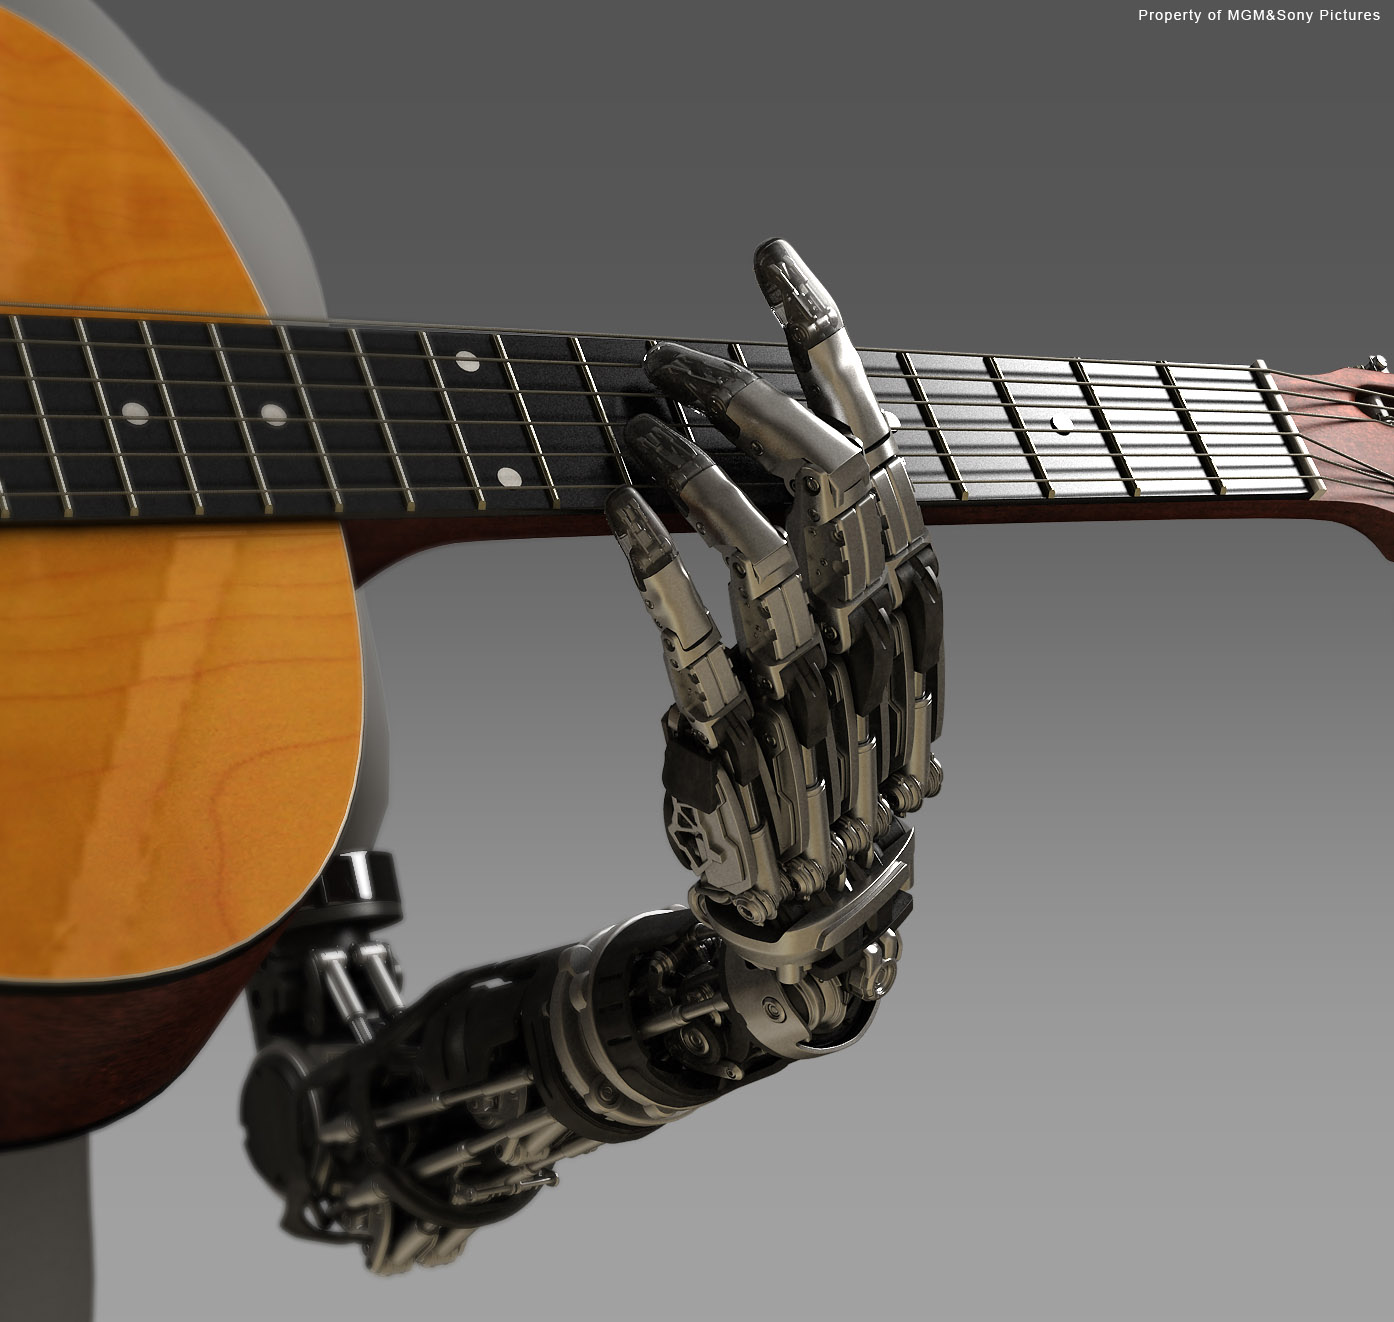 Robocop_Illustration_ProstheticHand_V05_PosedGuitar_020234 .jpg